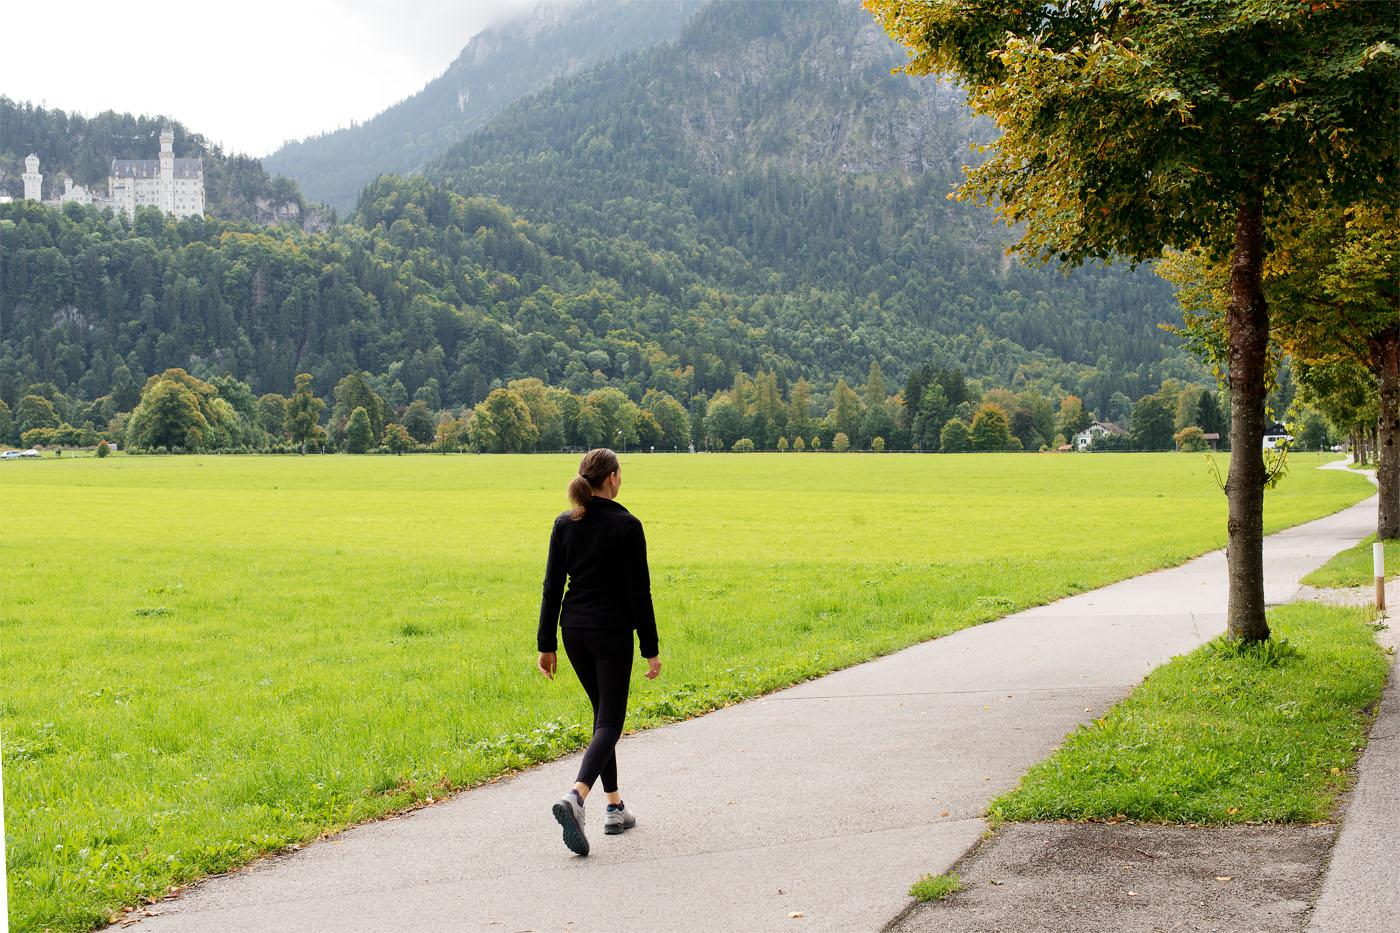 schloss-neuschwanstein-fuessen-allgaeu-wanderung-travelbericht